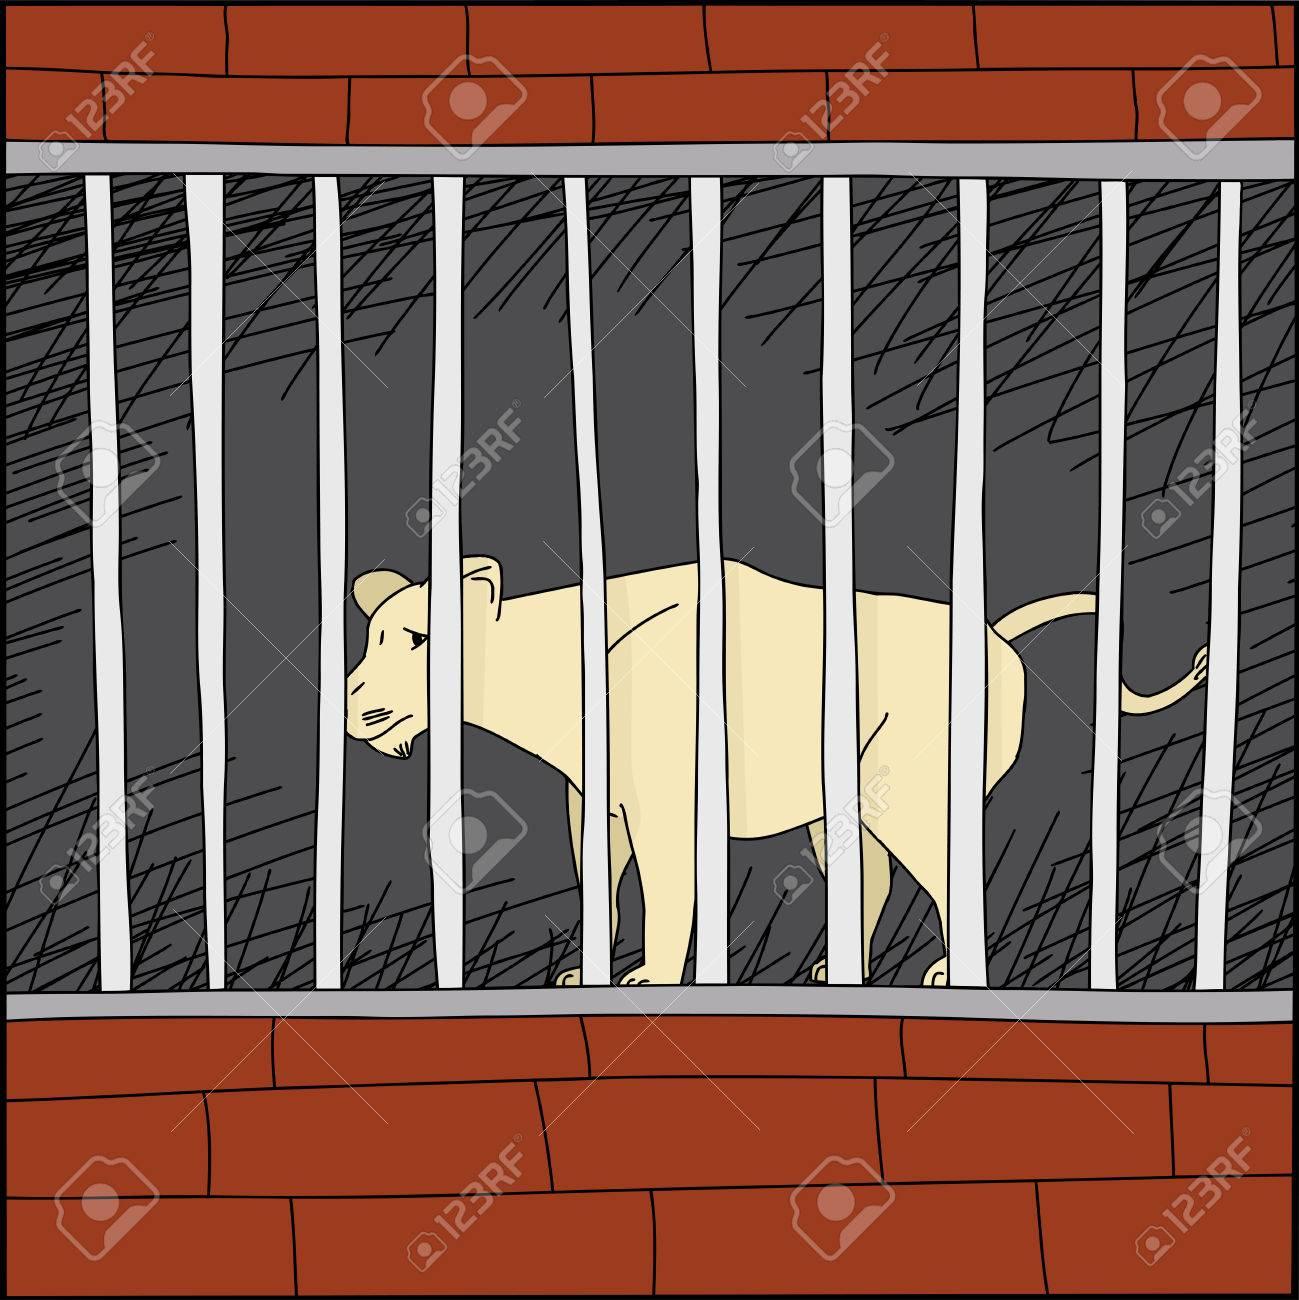 Sad Lion Cartoon Cartoon of Sad Lion Behind